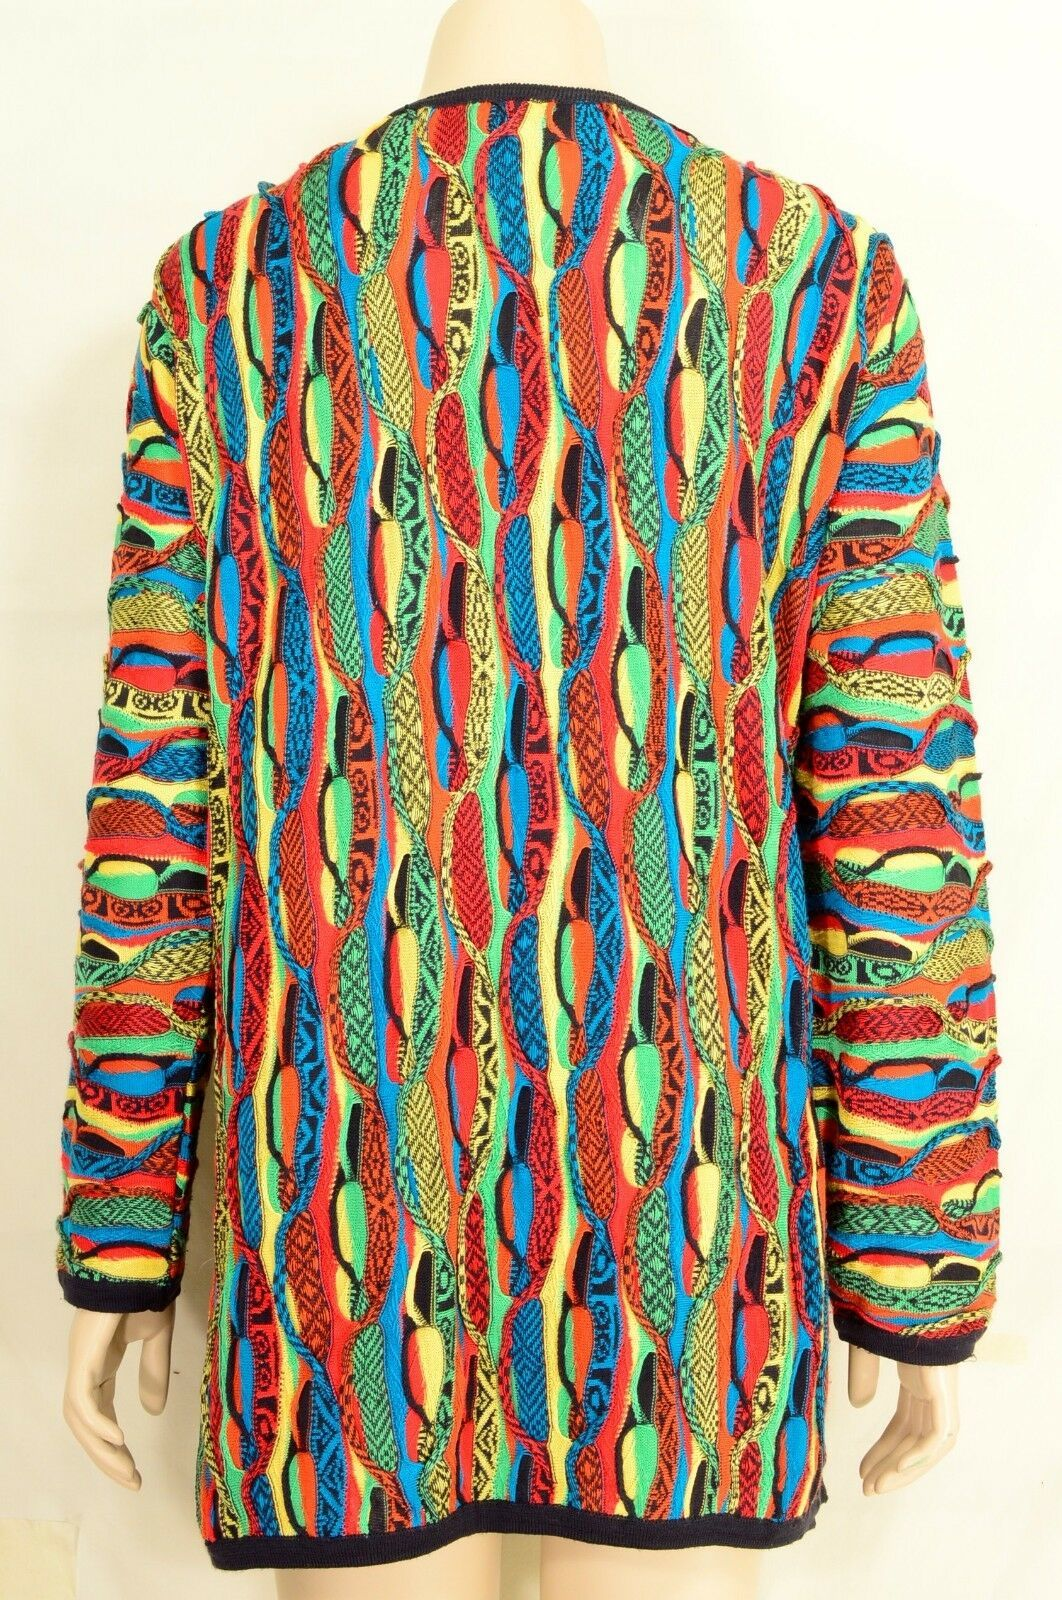 COOGI sweater SZ M 100% silk cardigan brilliant colors long sleeve vintage.